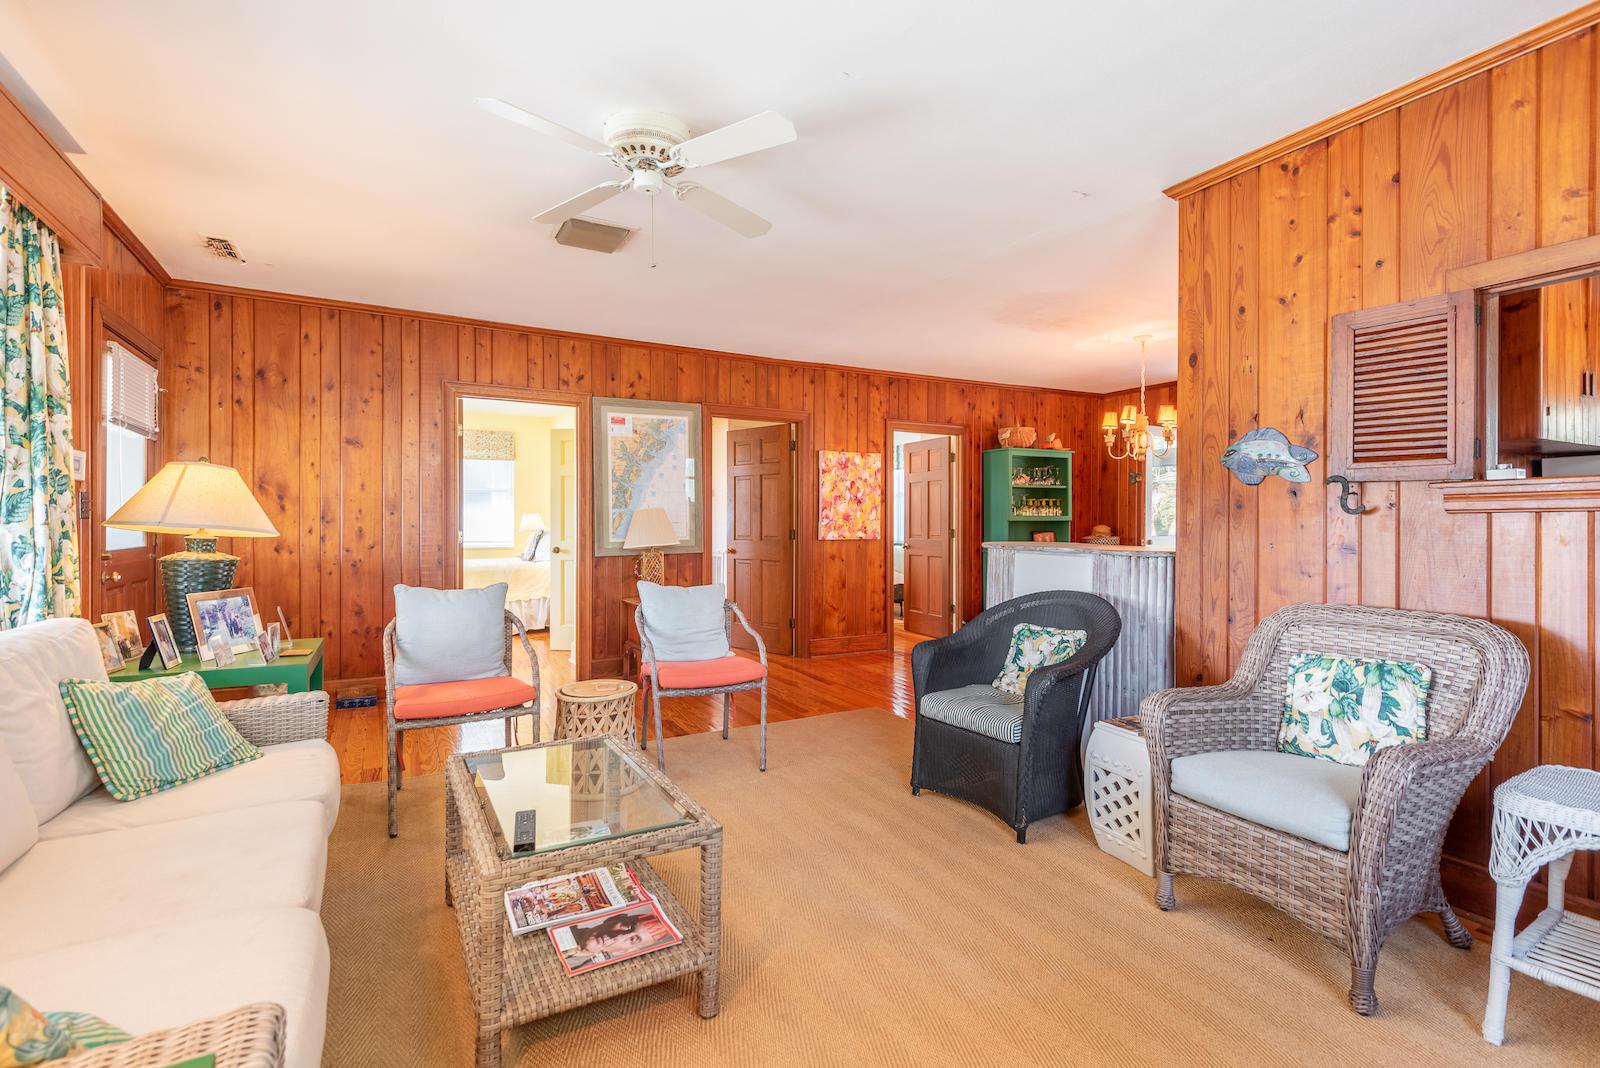 Sullivans Island Homes For Sale - 2525 Atlantic, Sullivans Island, SC - 14